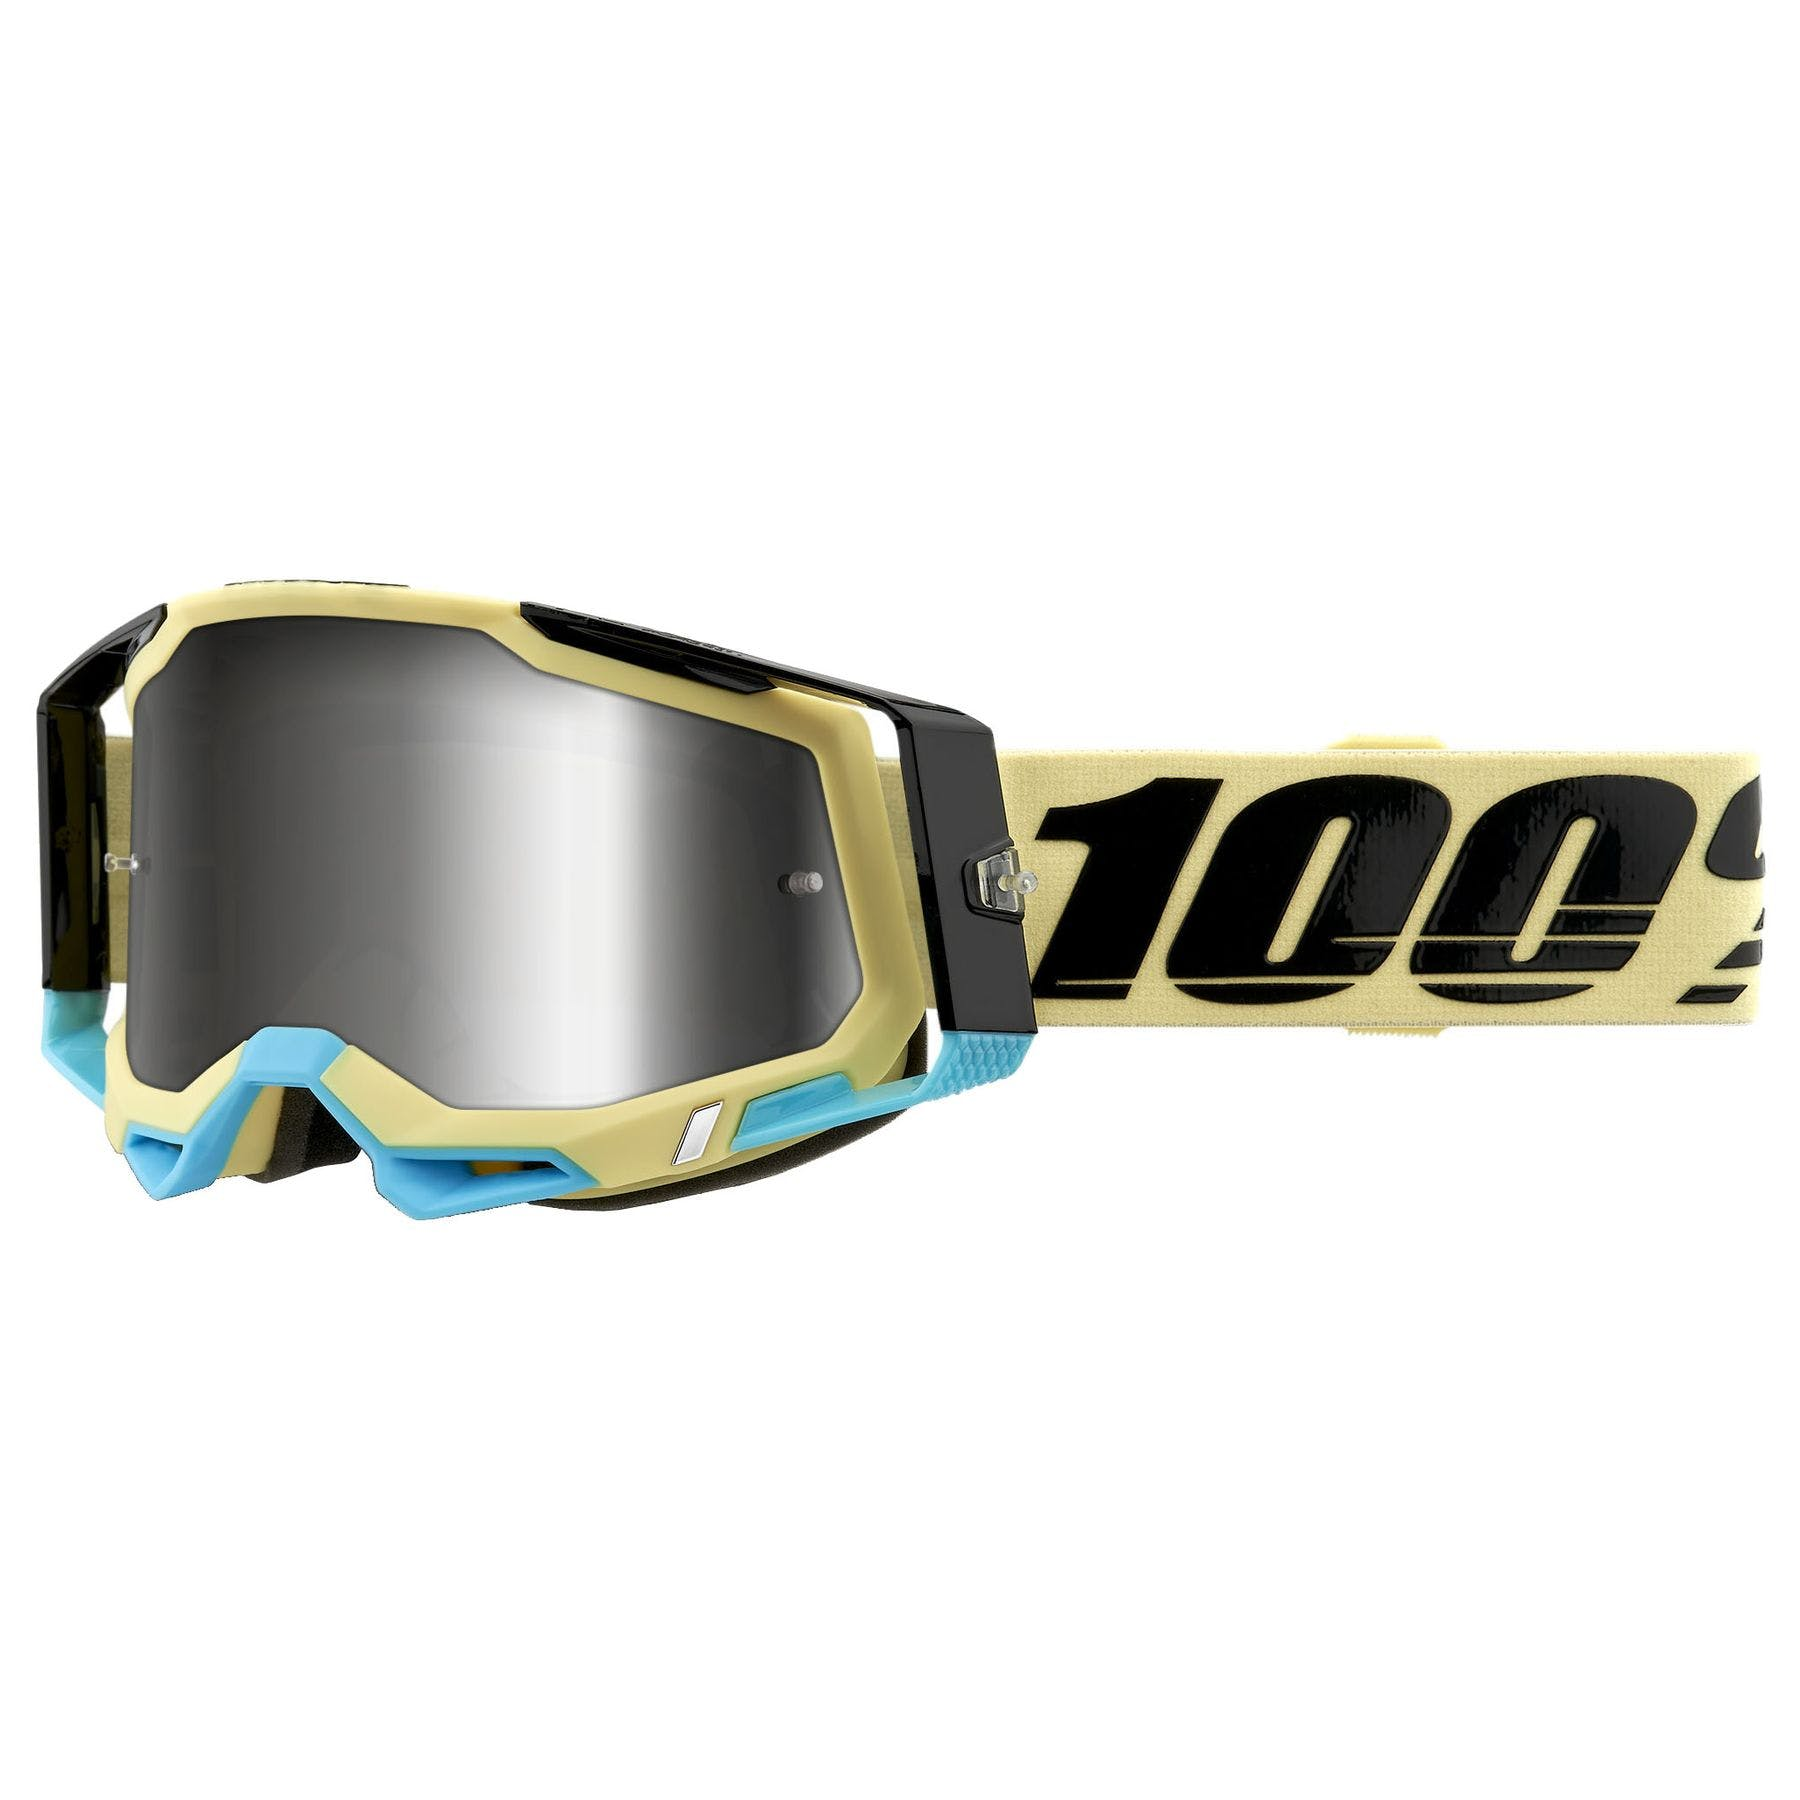 Oxford Replacement Blue Tint Tear Off Lens For Assalt Pro Motocross MX Goggles